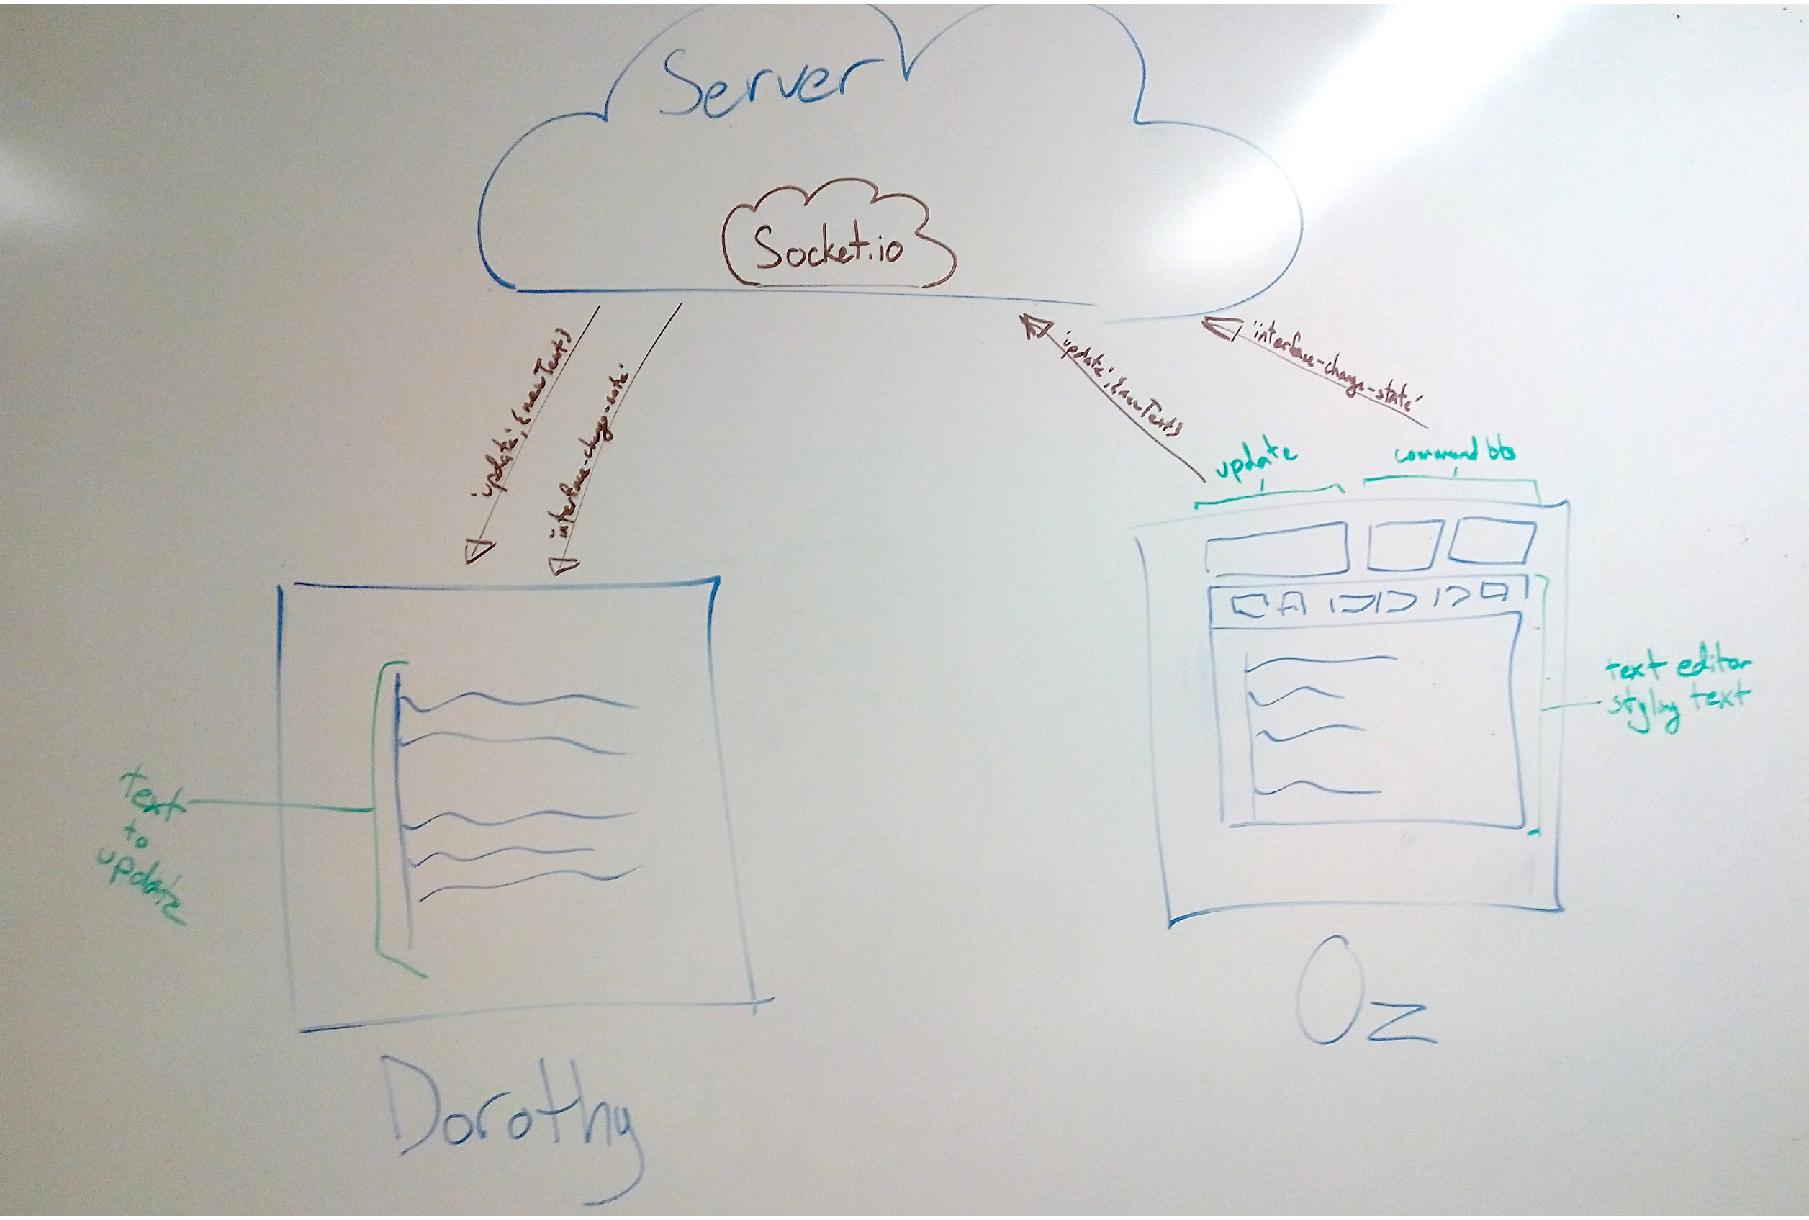 Basic system architecture.